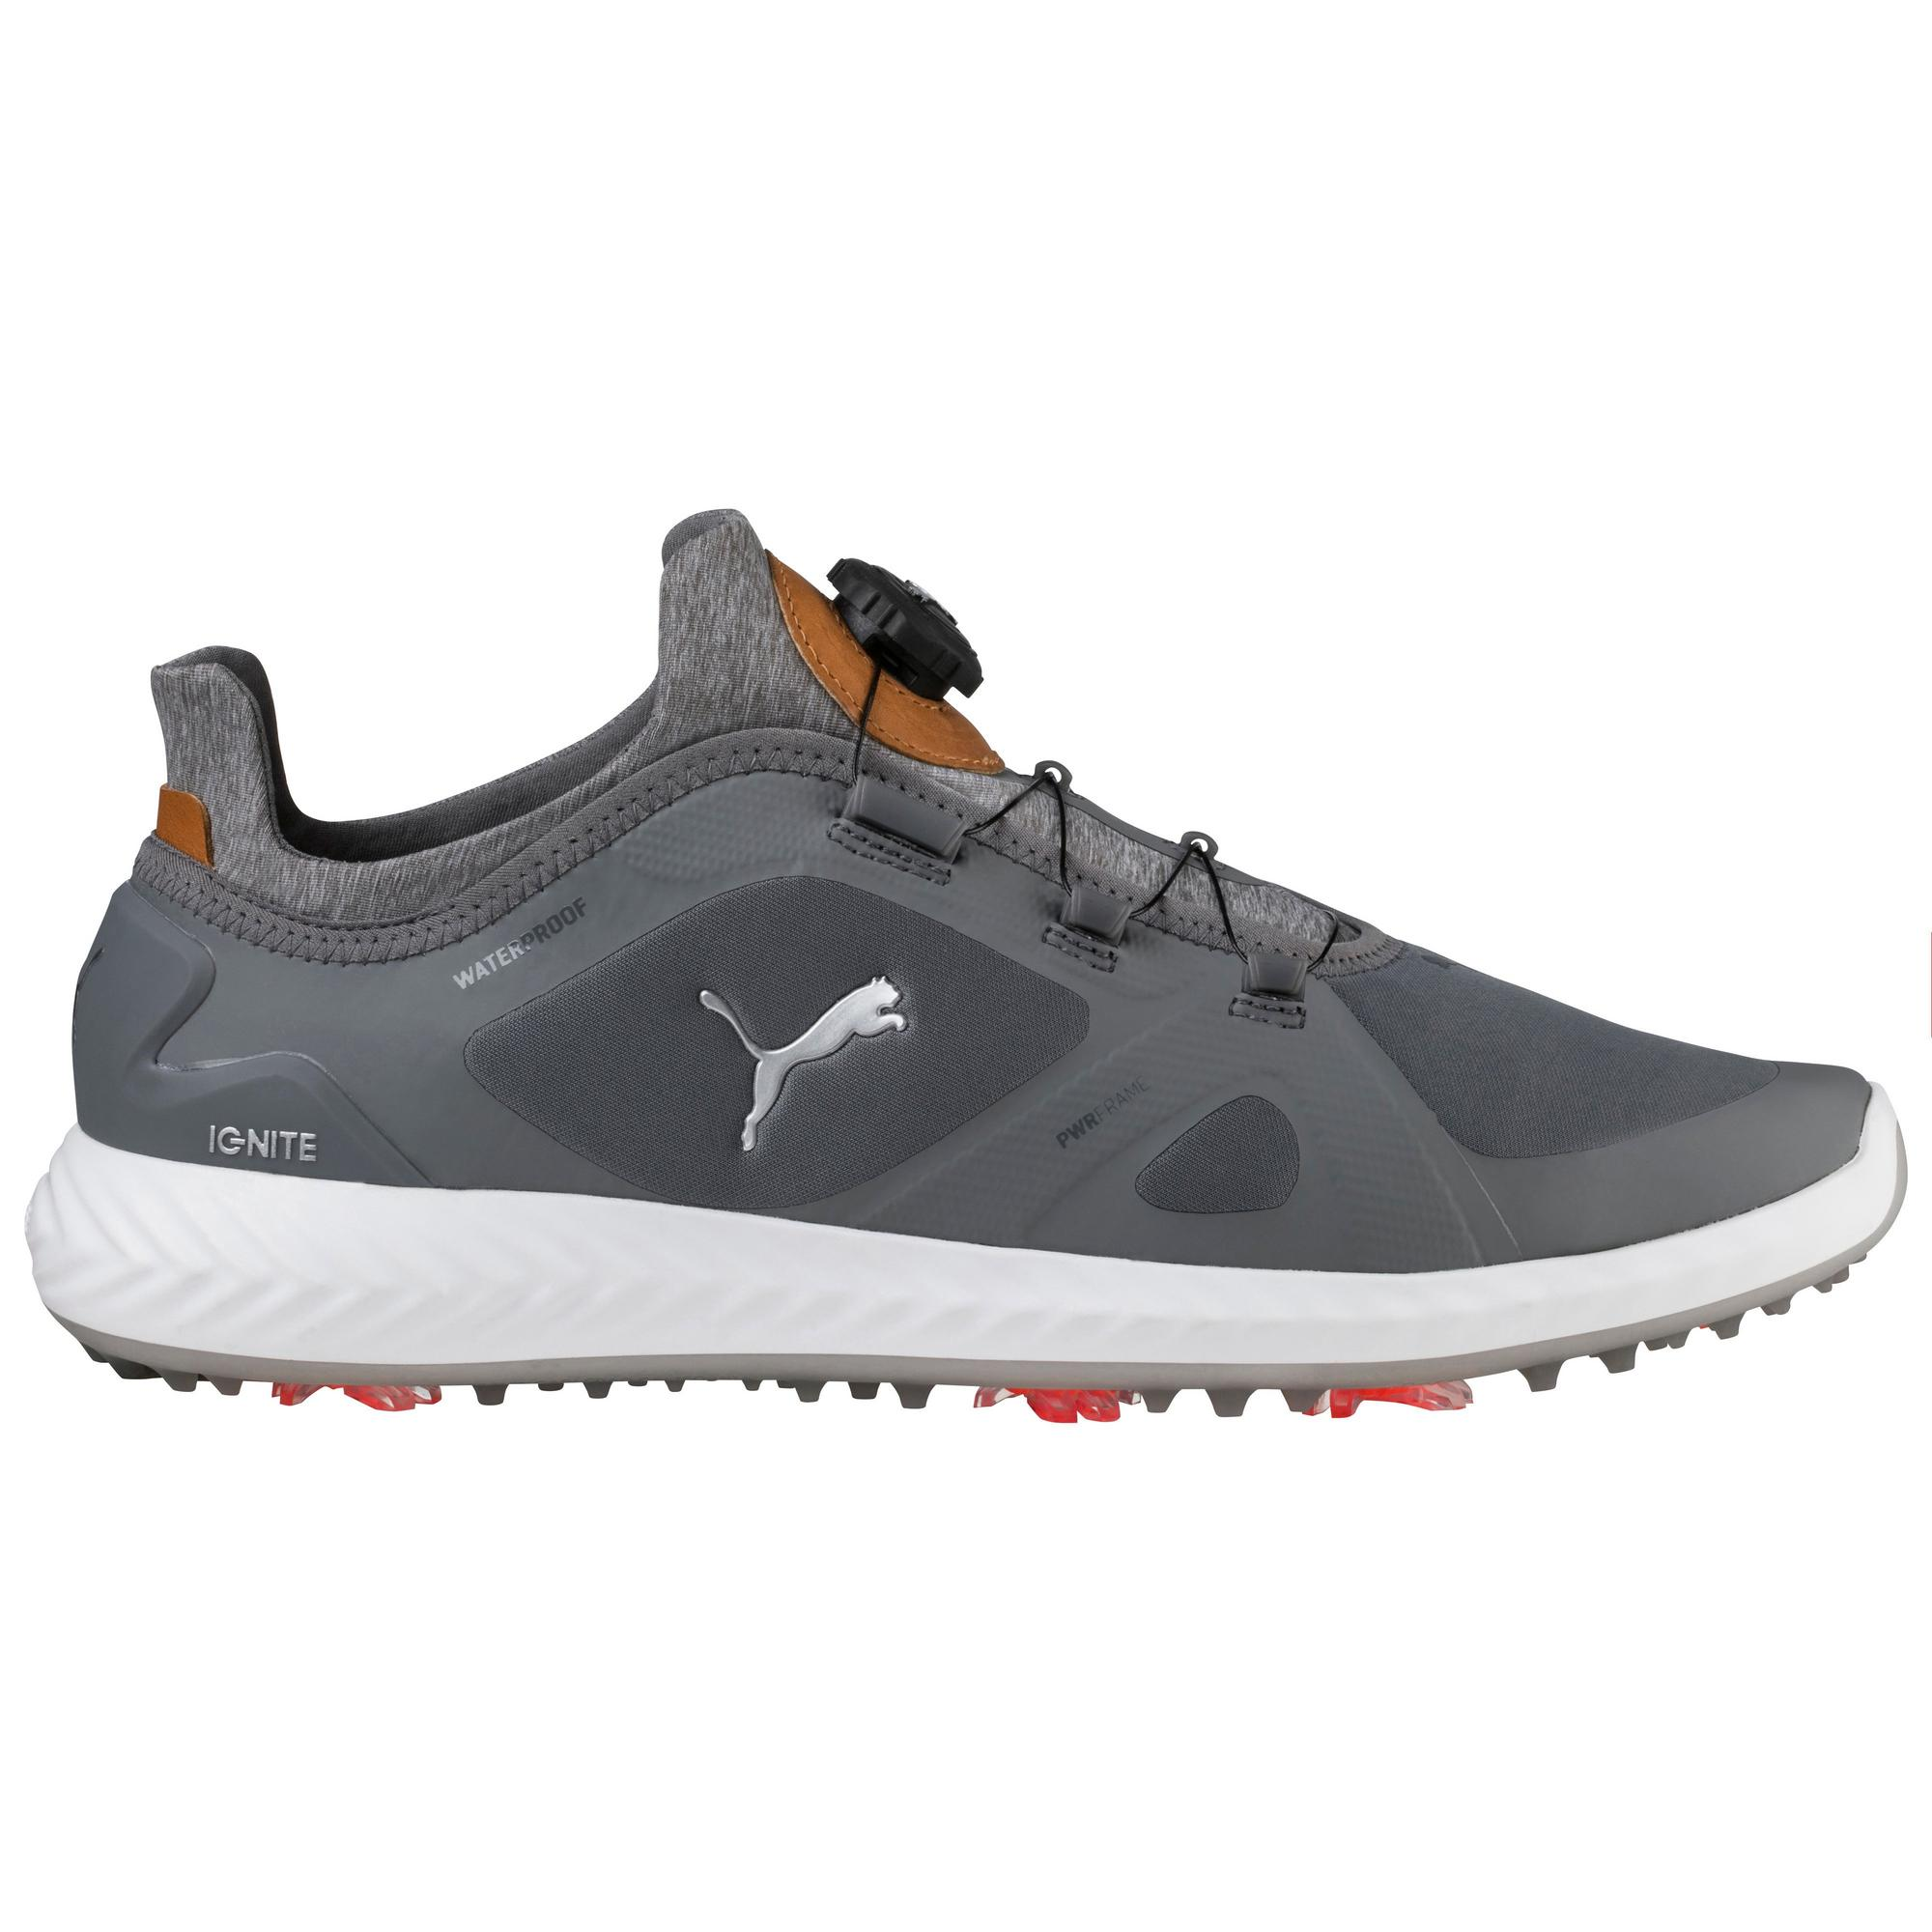 Men's Ignite Poweradapt Disc Spiked Golf Shoe - LTGRY